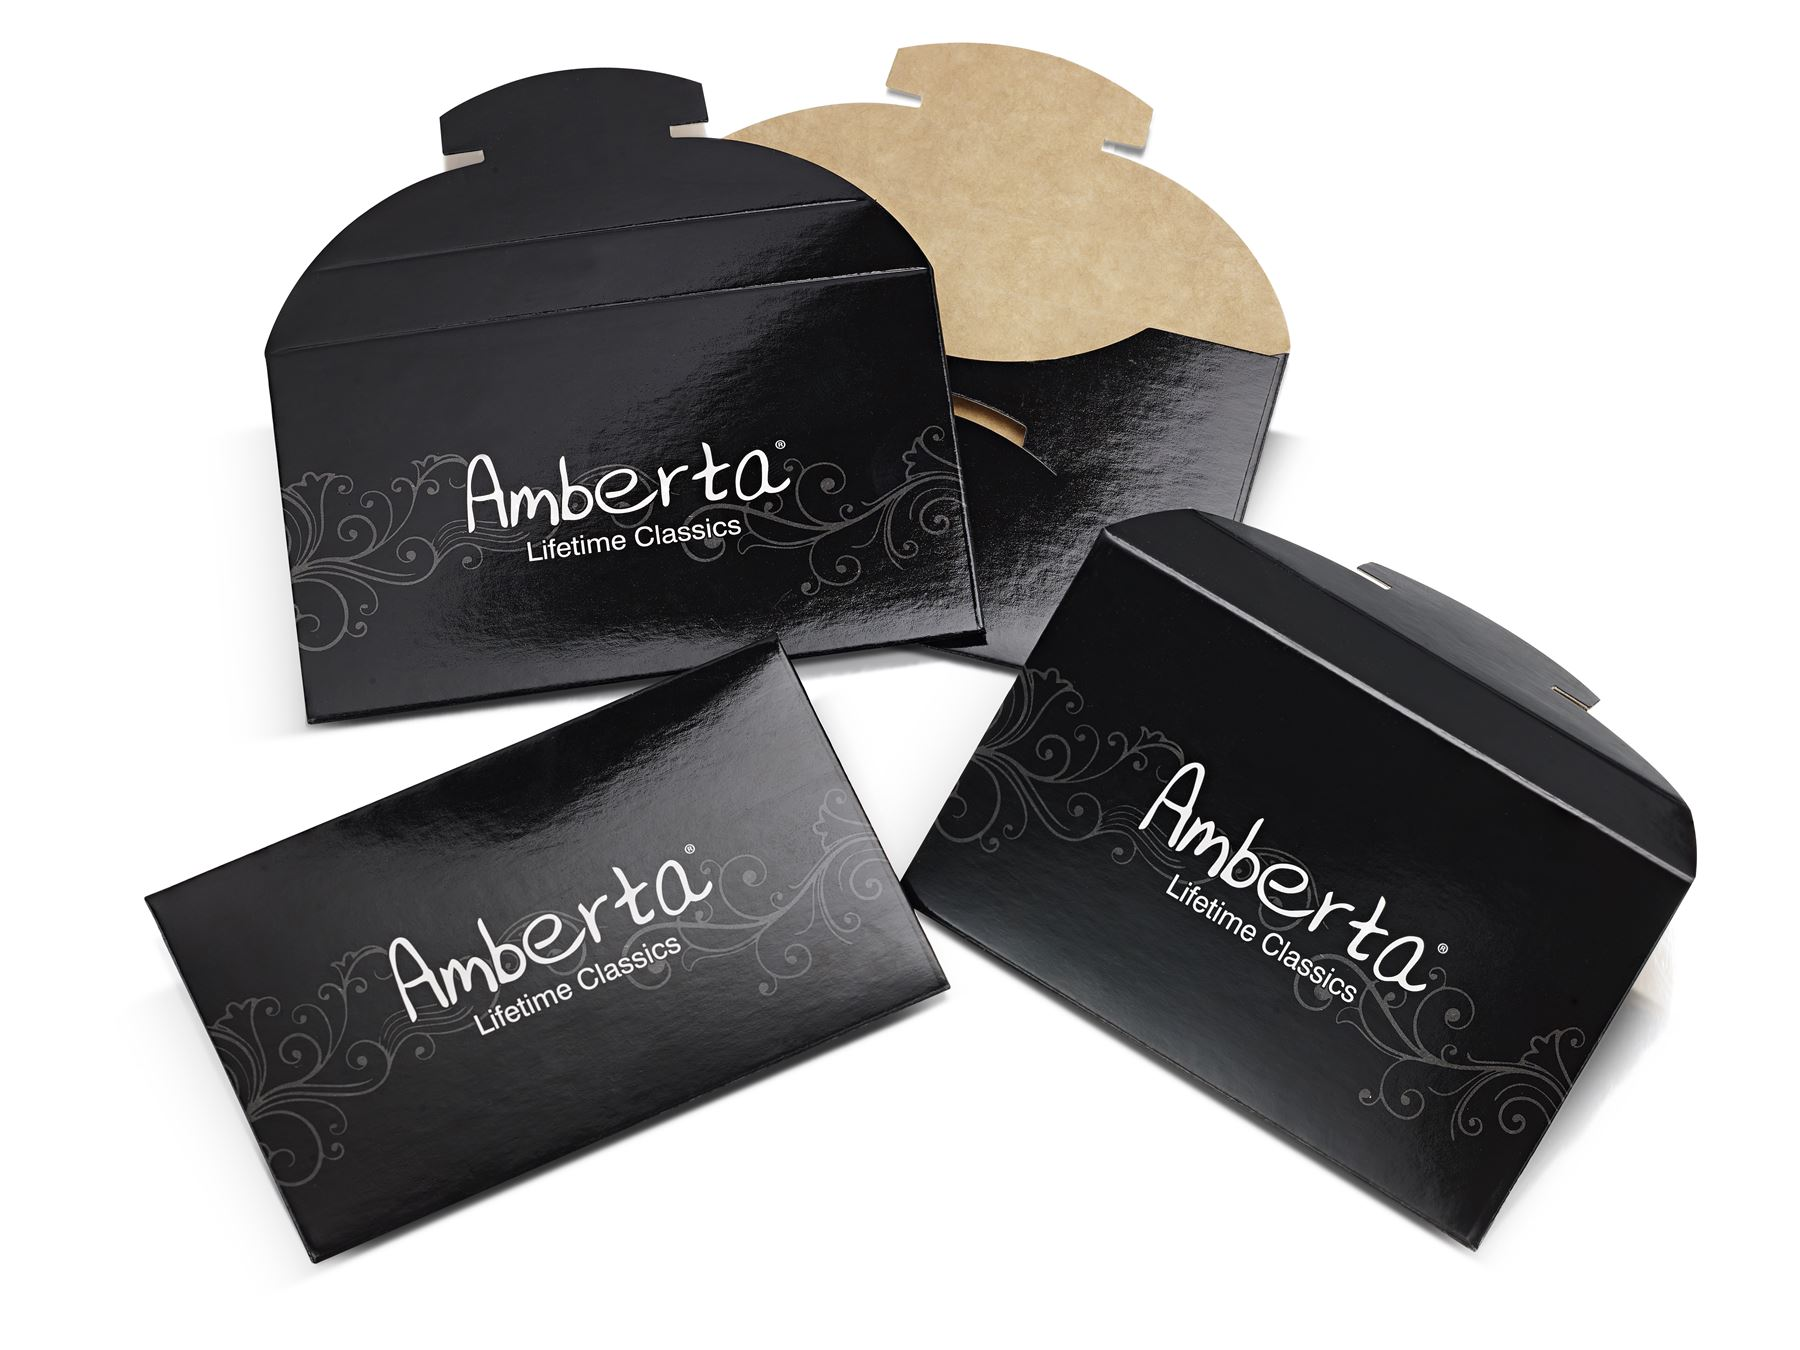 Amberta-Jewelry-925-Sterling-Silver-Adjustable-Bracelet-Italian-Bangle-for-Women miniature 64